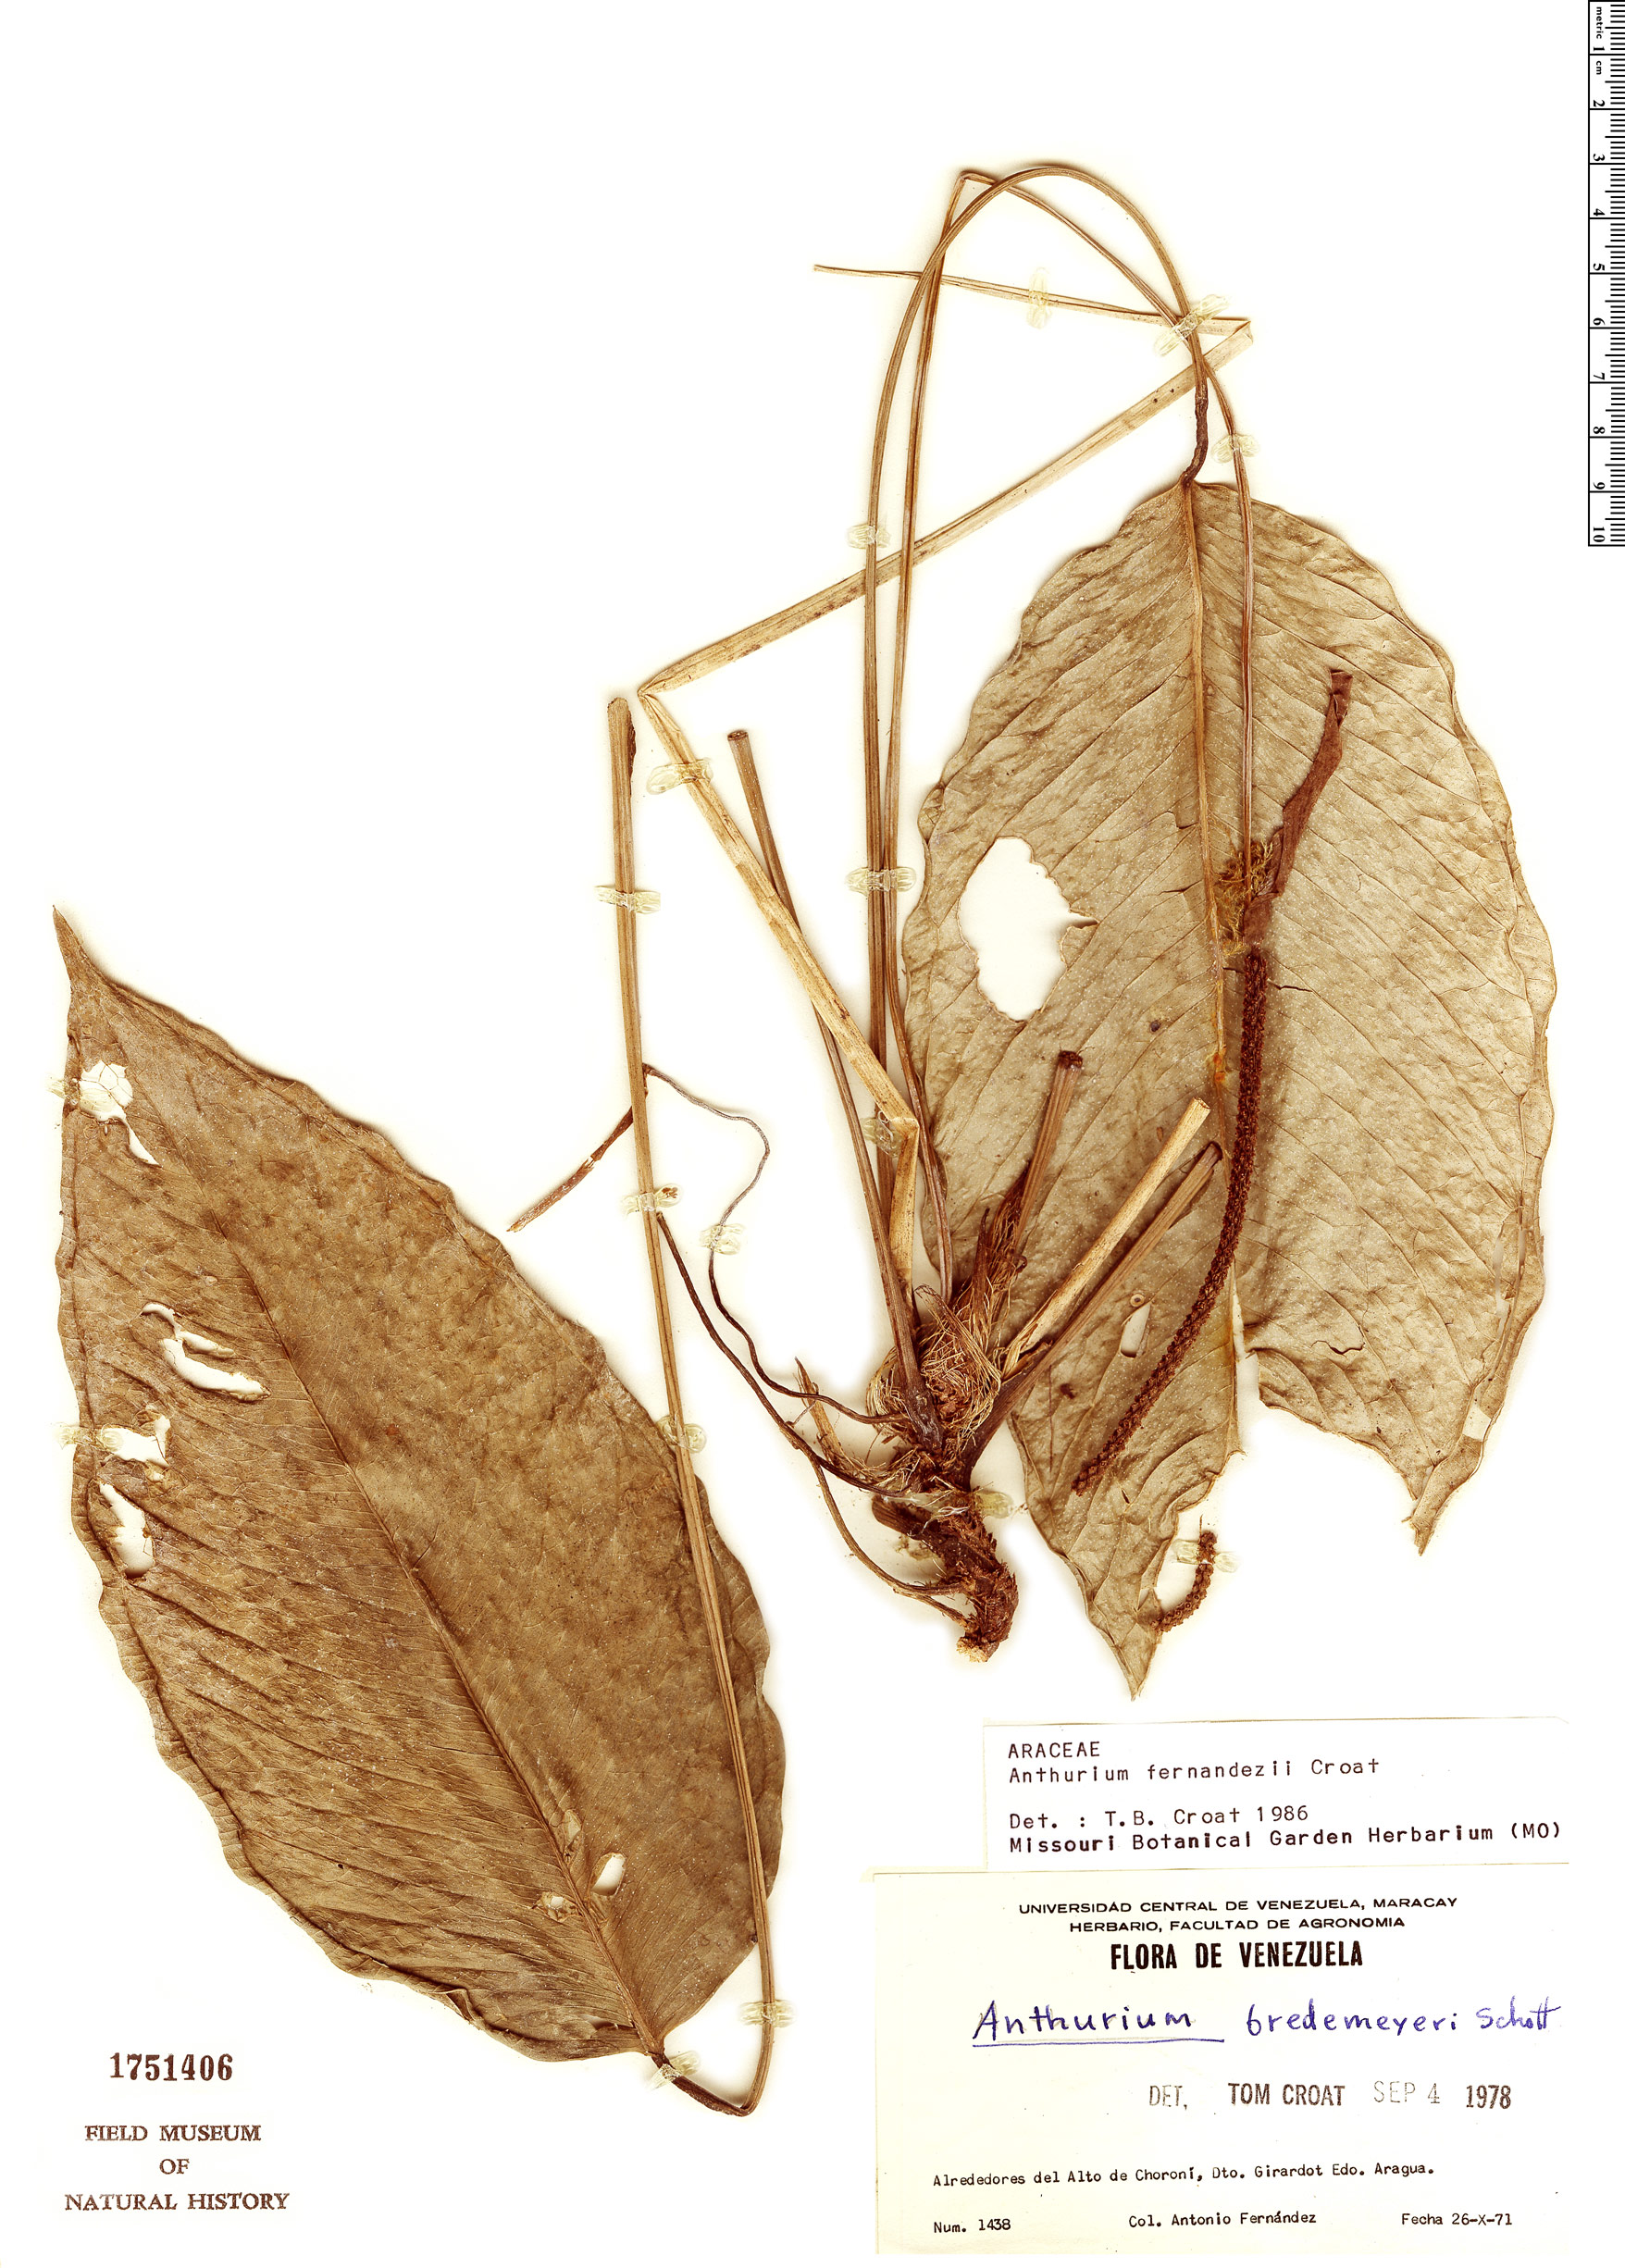 Espécimen: Anthurium fernandezii